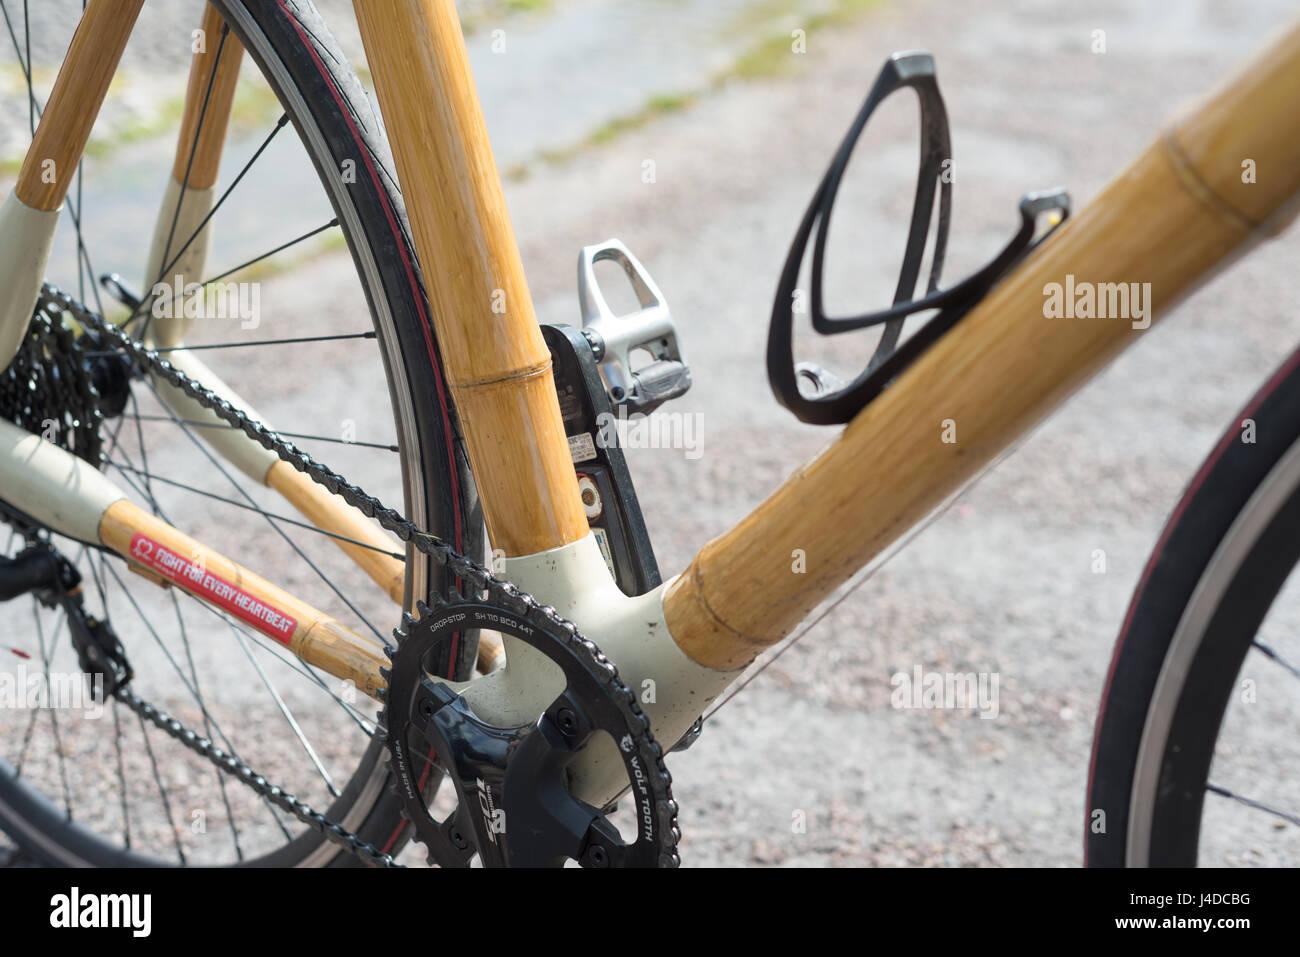 Bambus Fahrrad Stockfoto, Bild: 140436676 - Alamy